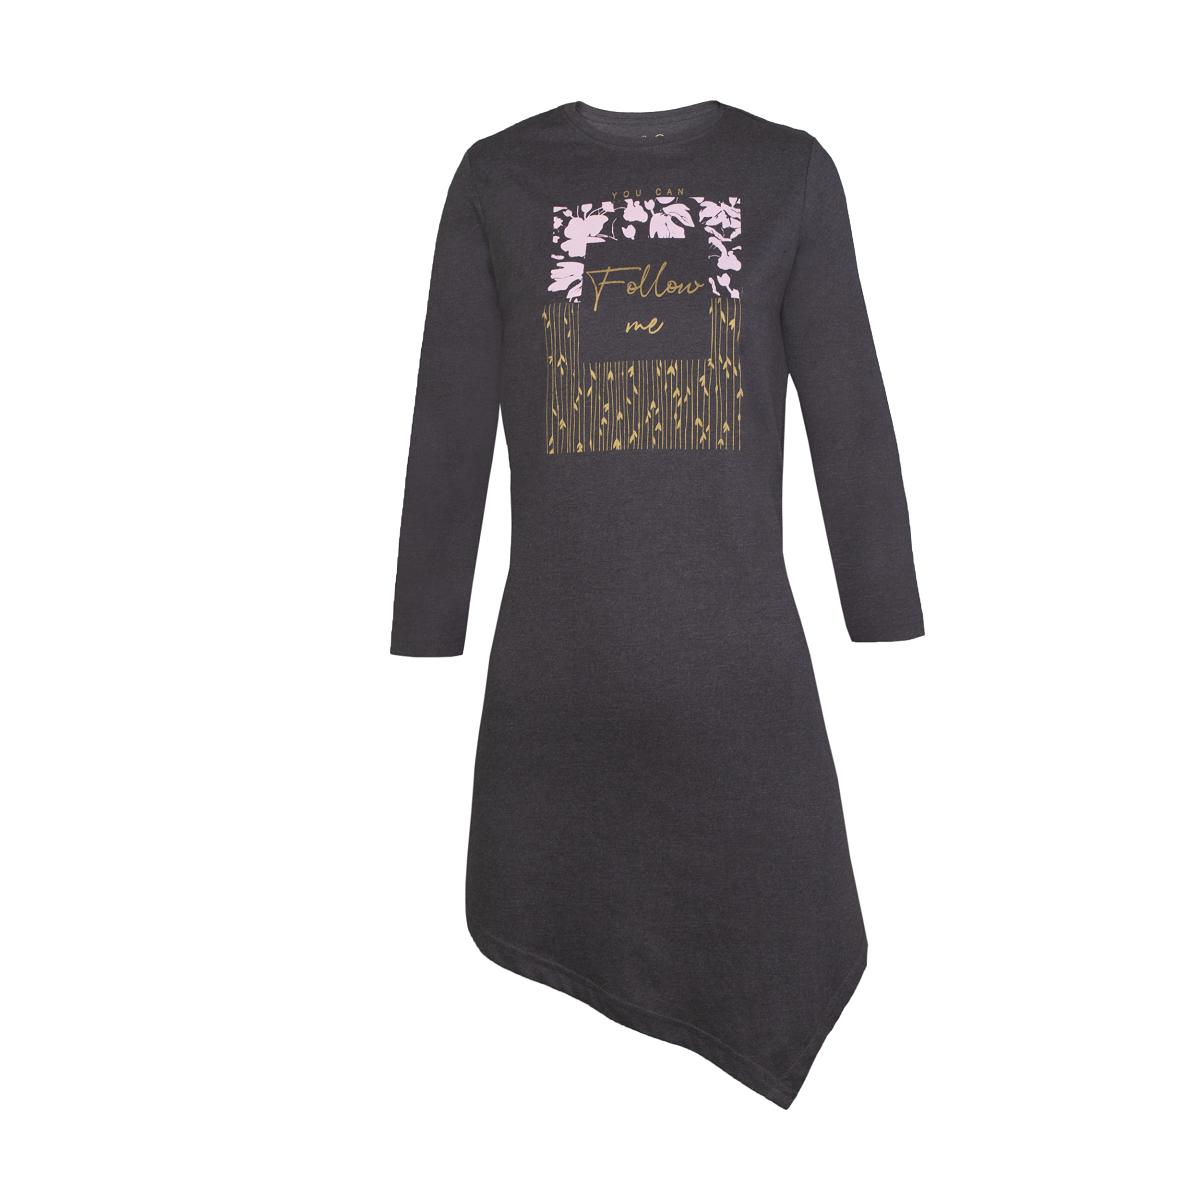 Ženska tunika, temno melange siva